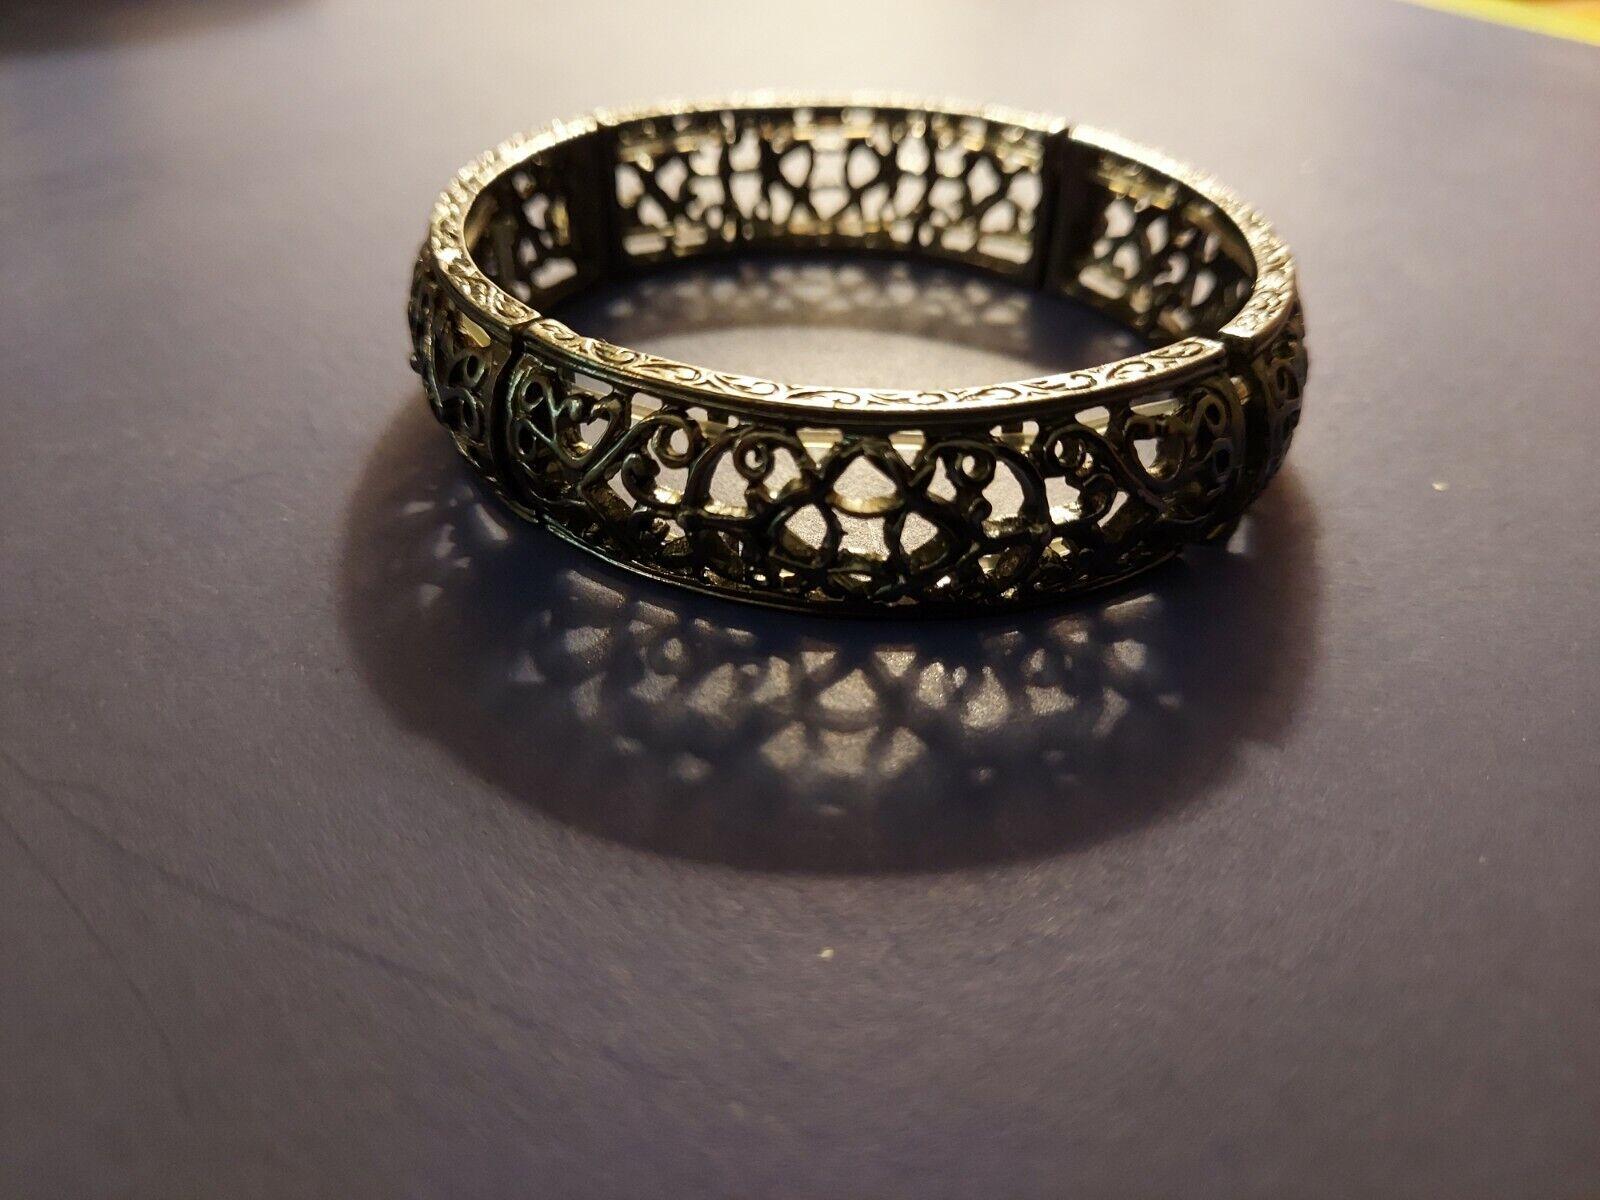 Bracelet Lot, Costume Jewelry - image 5